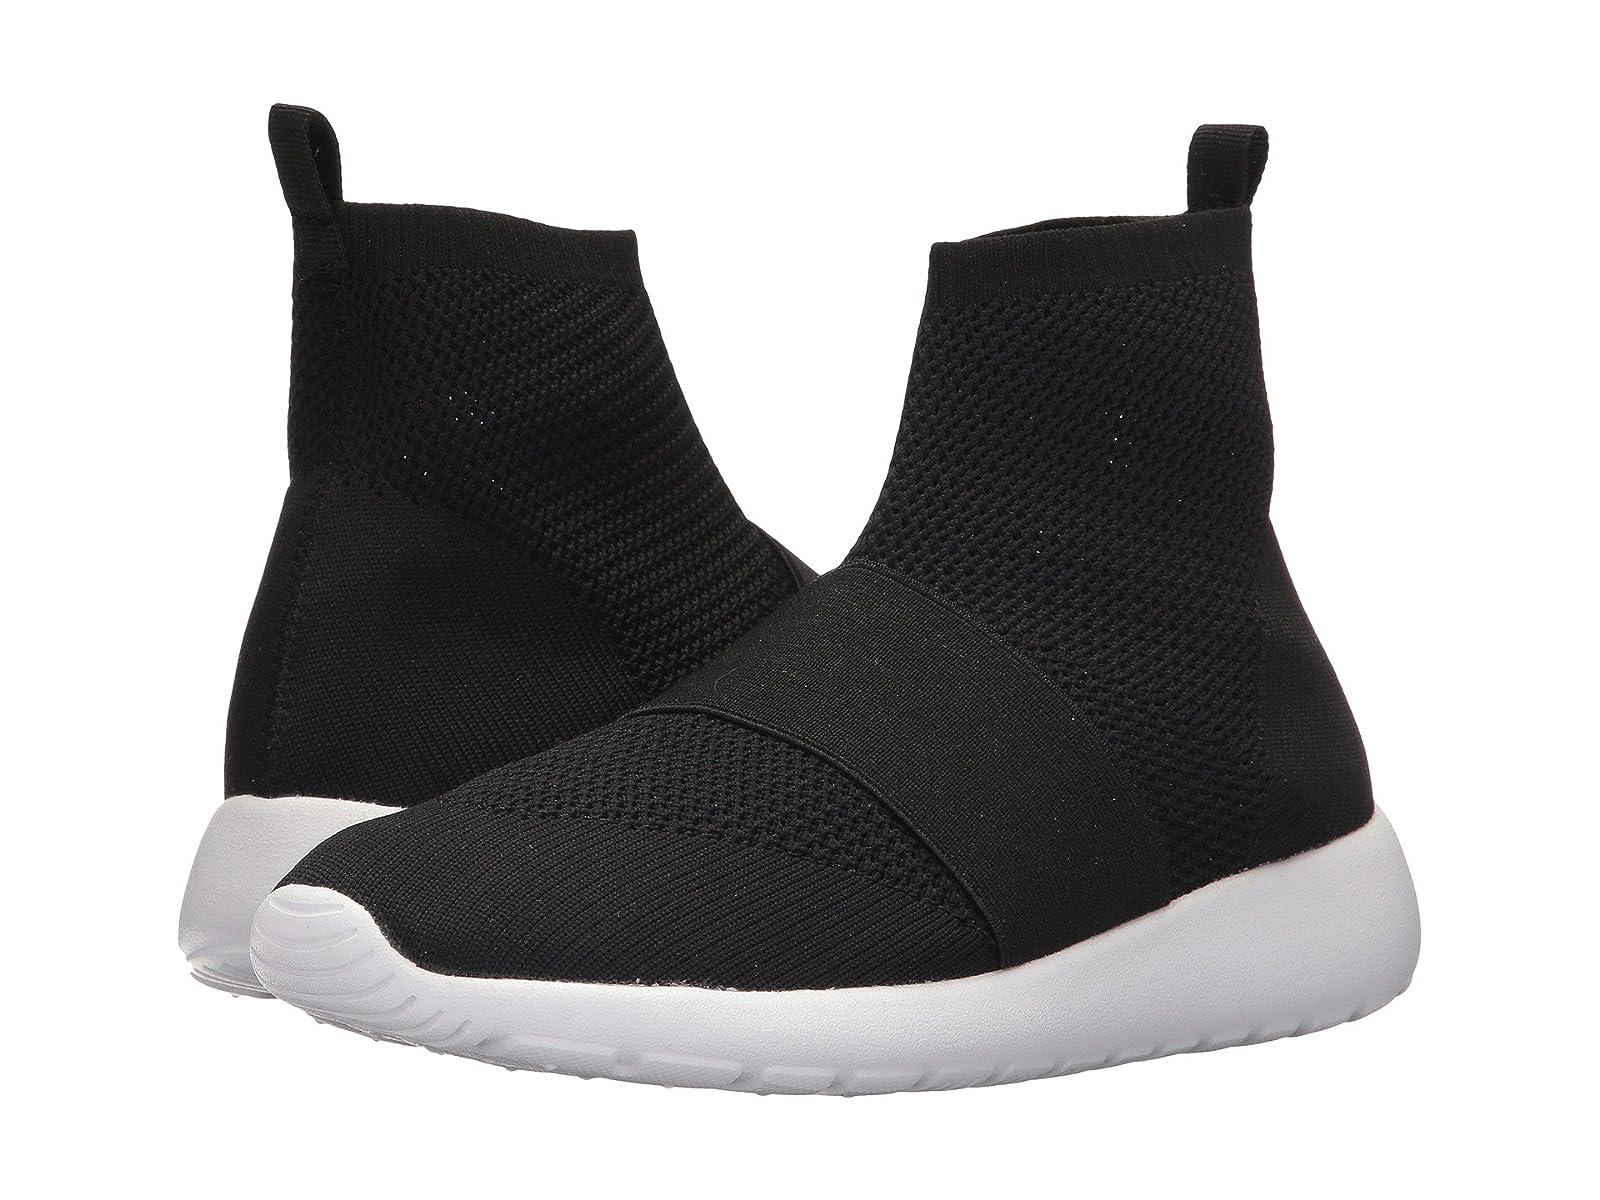 Dolce Vita FutureCheap and distinctive eye-catching shoes